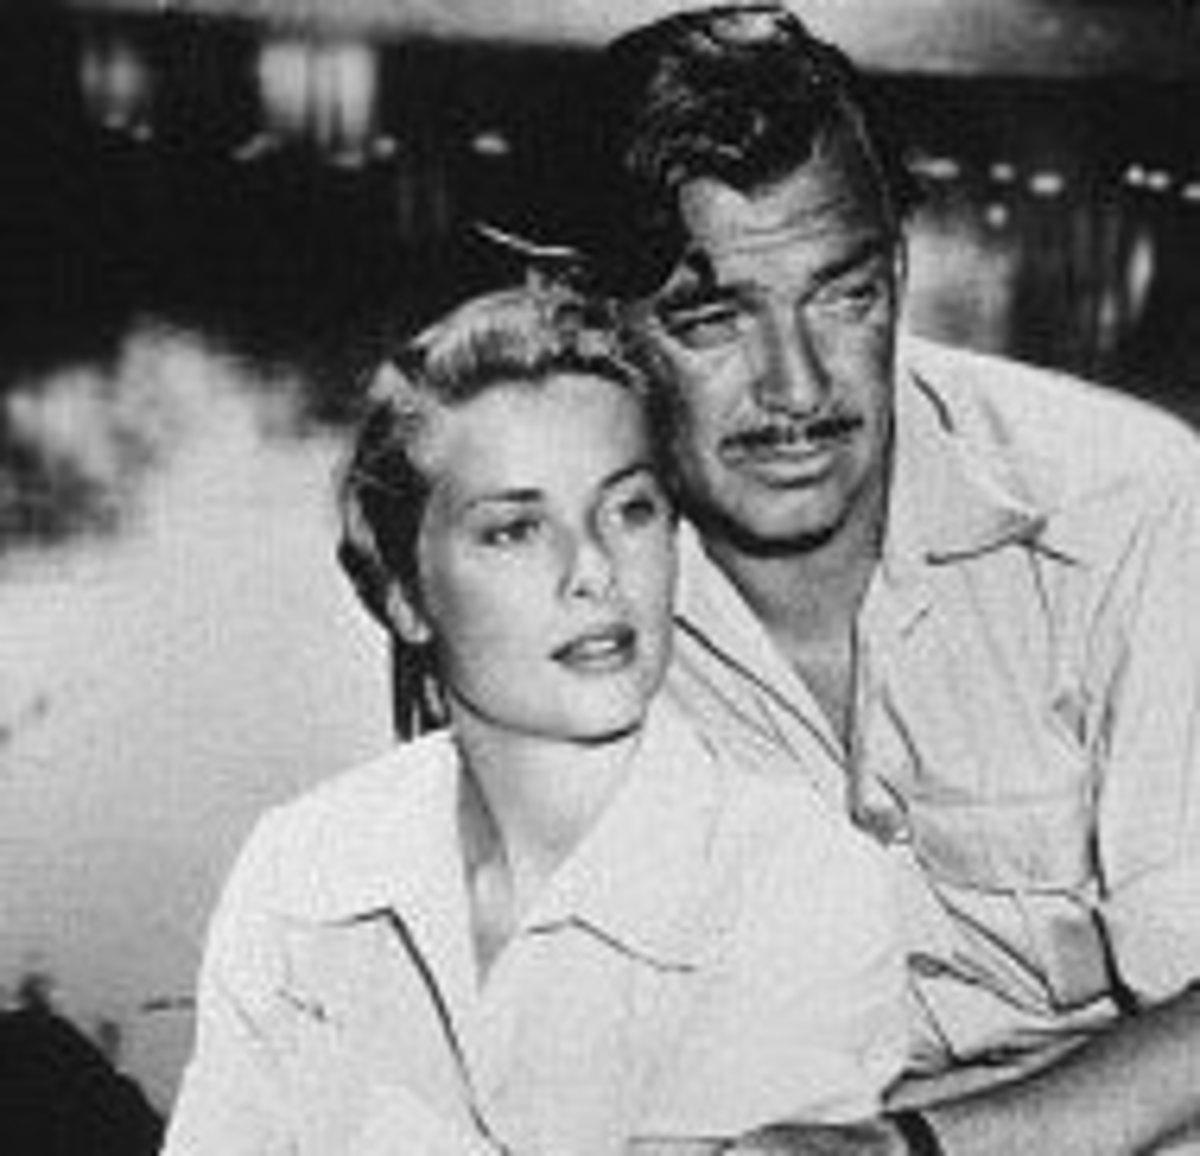 With Clark Gable in Mogambo